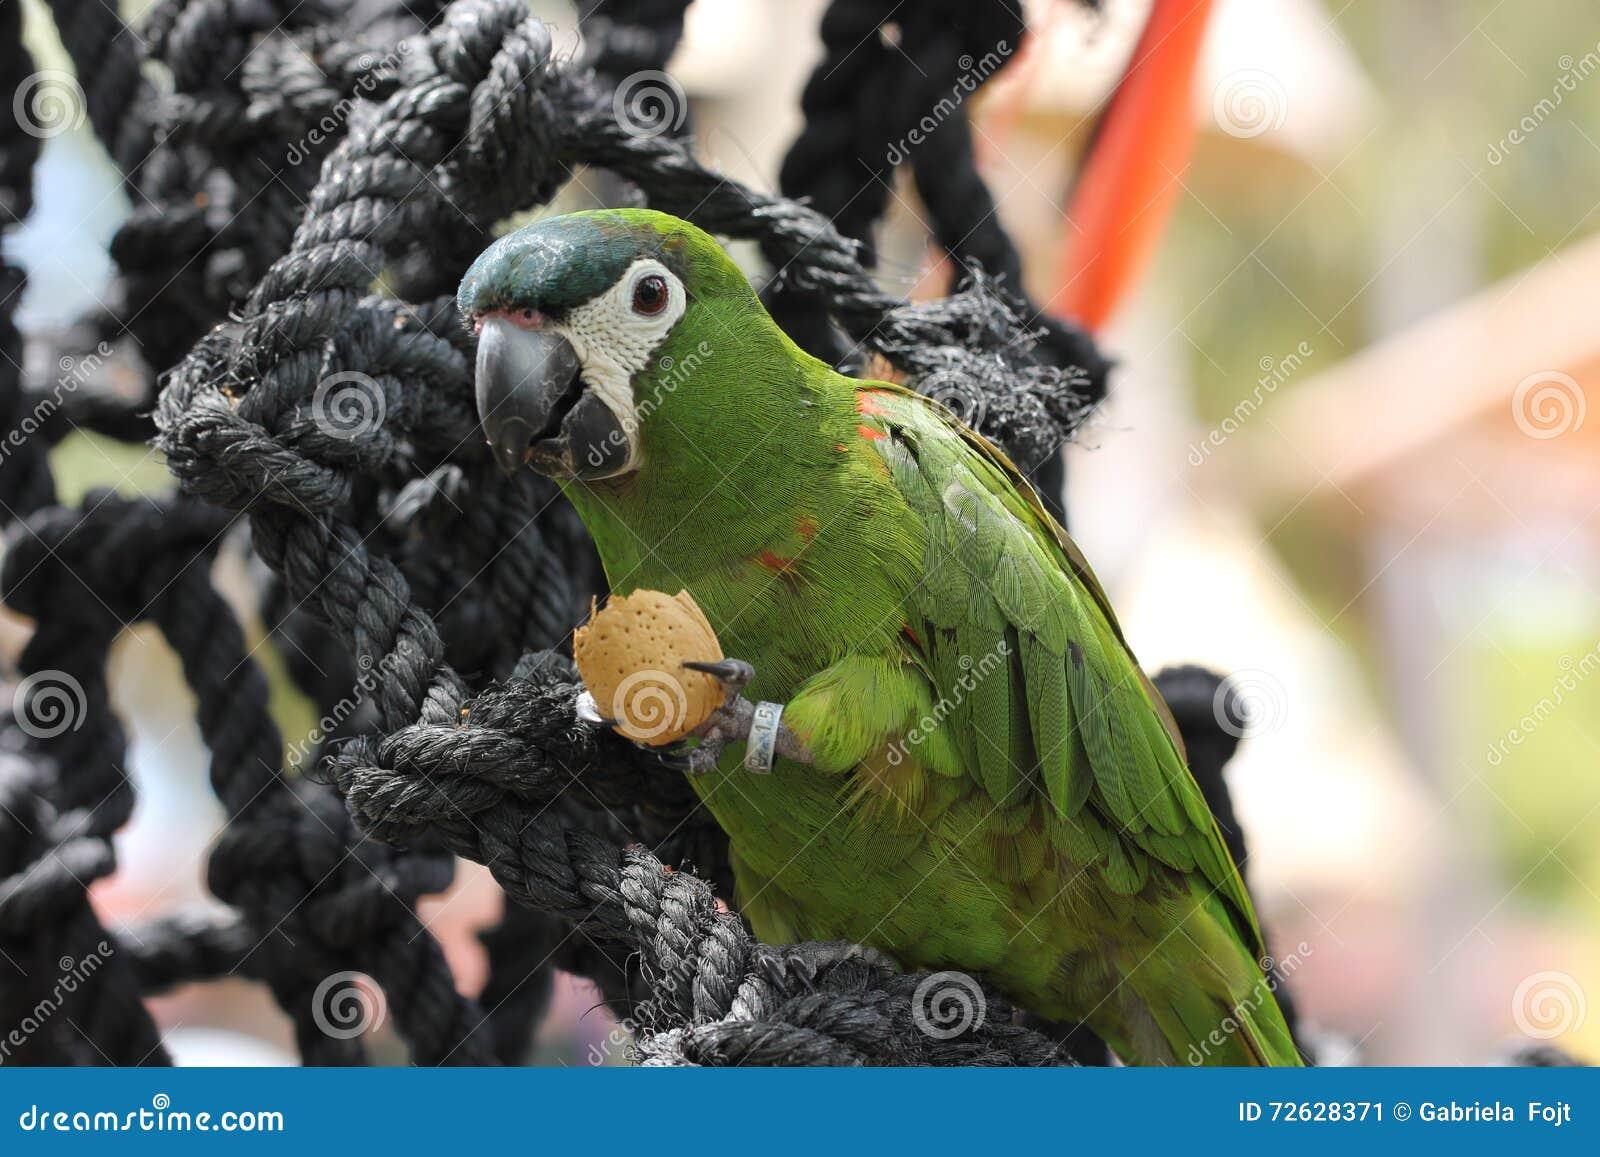 little green parrot stock photo image 72628371. Black Bedroom Furniture Sets. Home Design Ideas